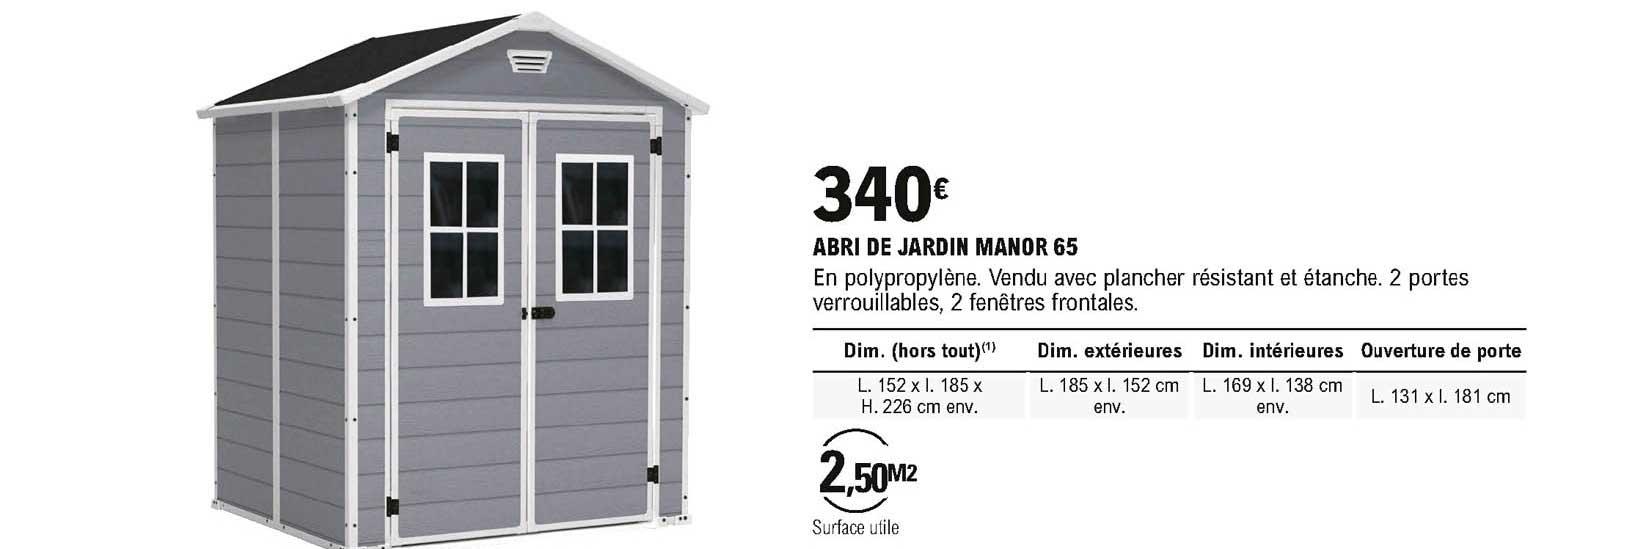 Offre Abri De Jardin Manor 65 Chez Eleclerc Brico